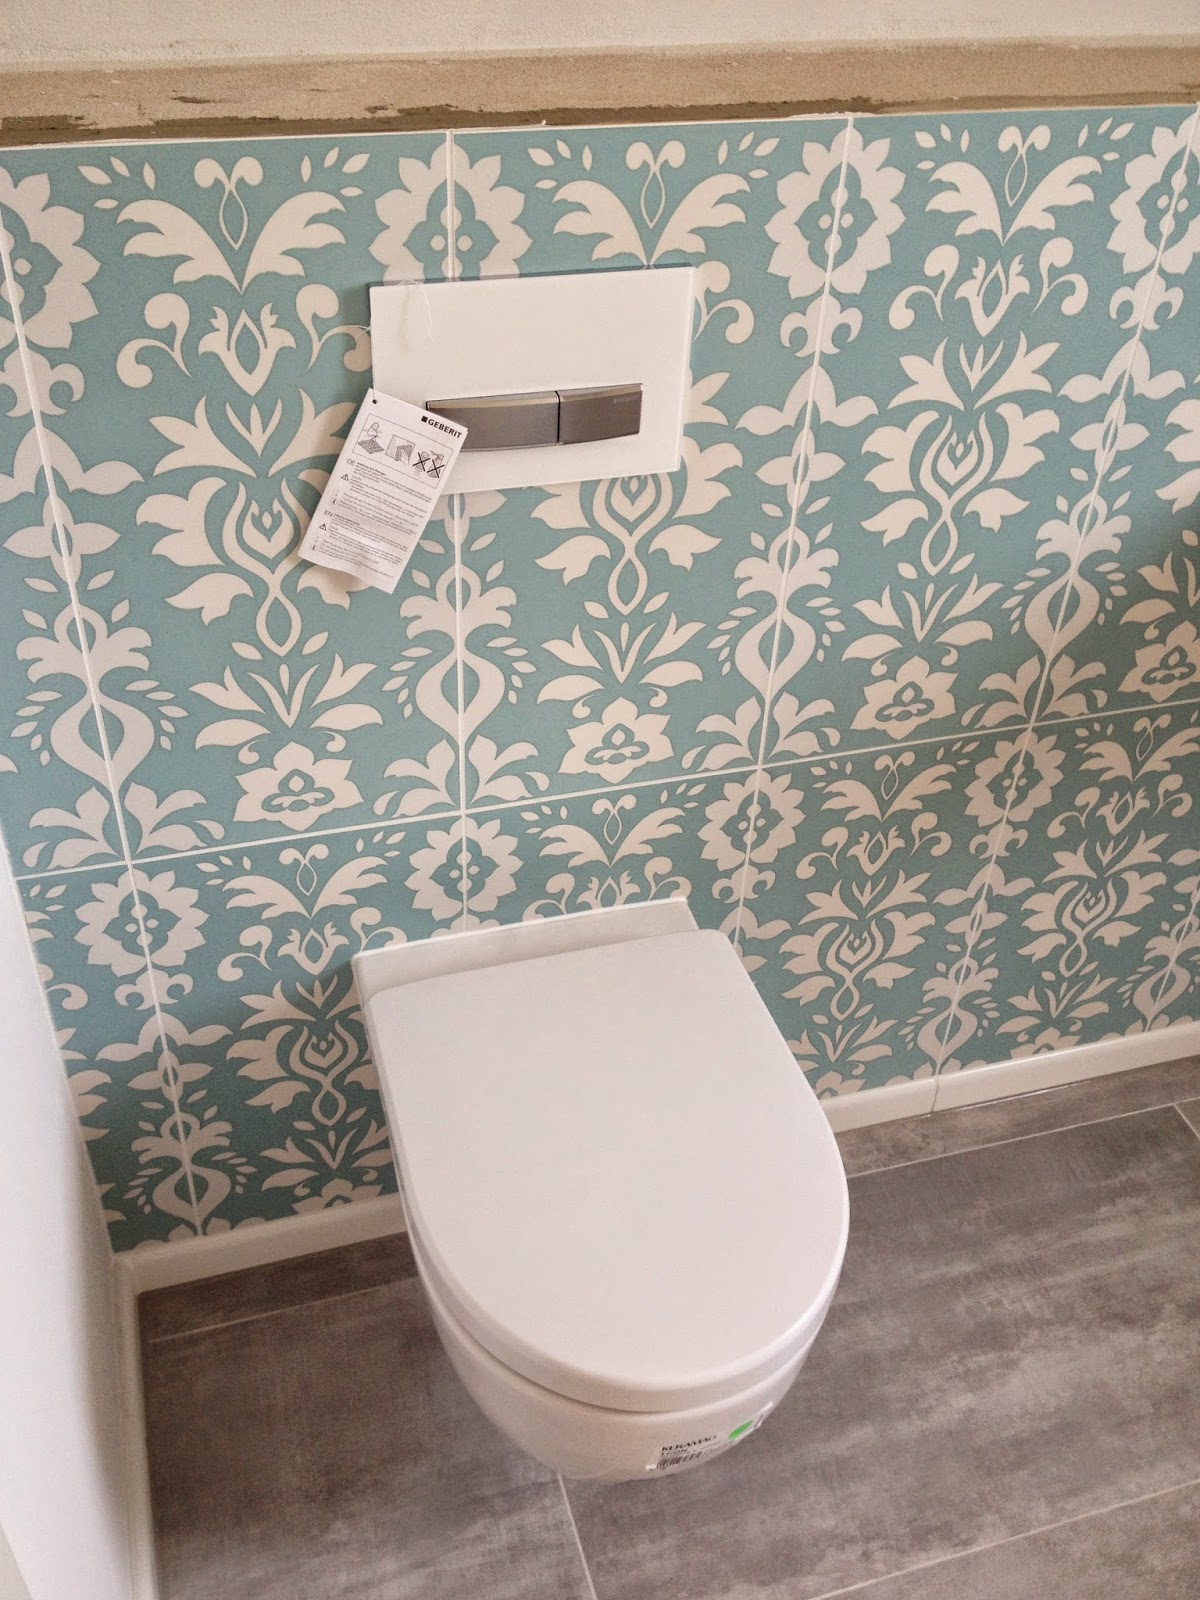 erlenhof 38 auf nach ahrensburg september 2014. Black Bedroom Furniture Sets. Home Design Ideas